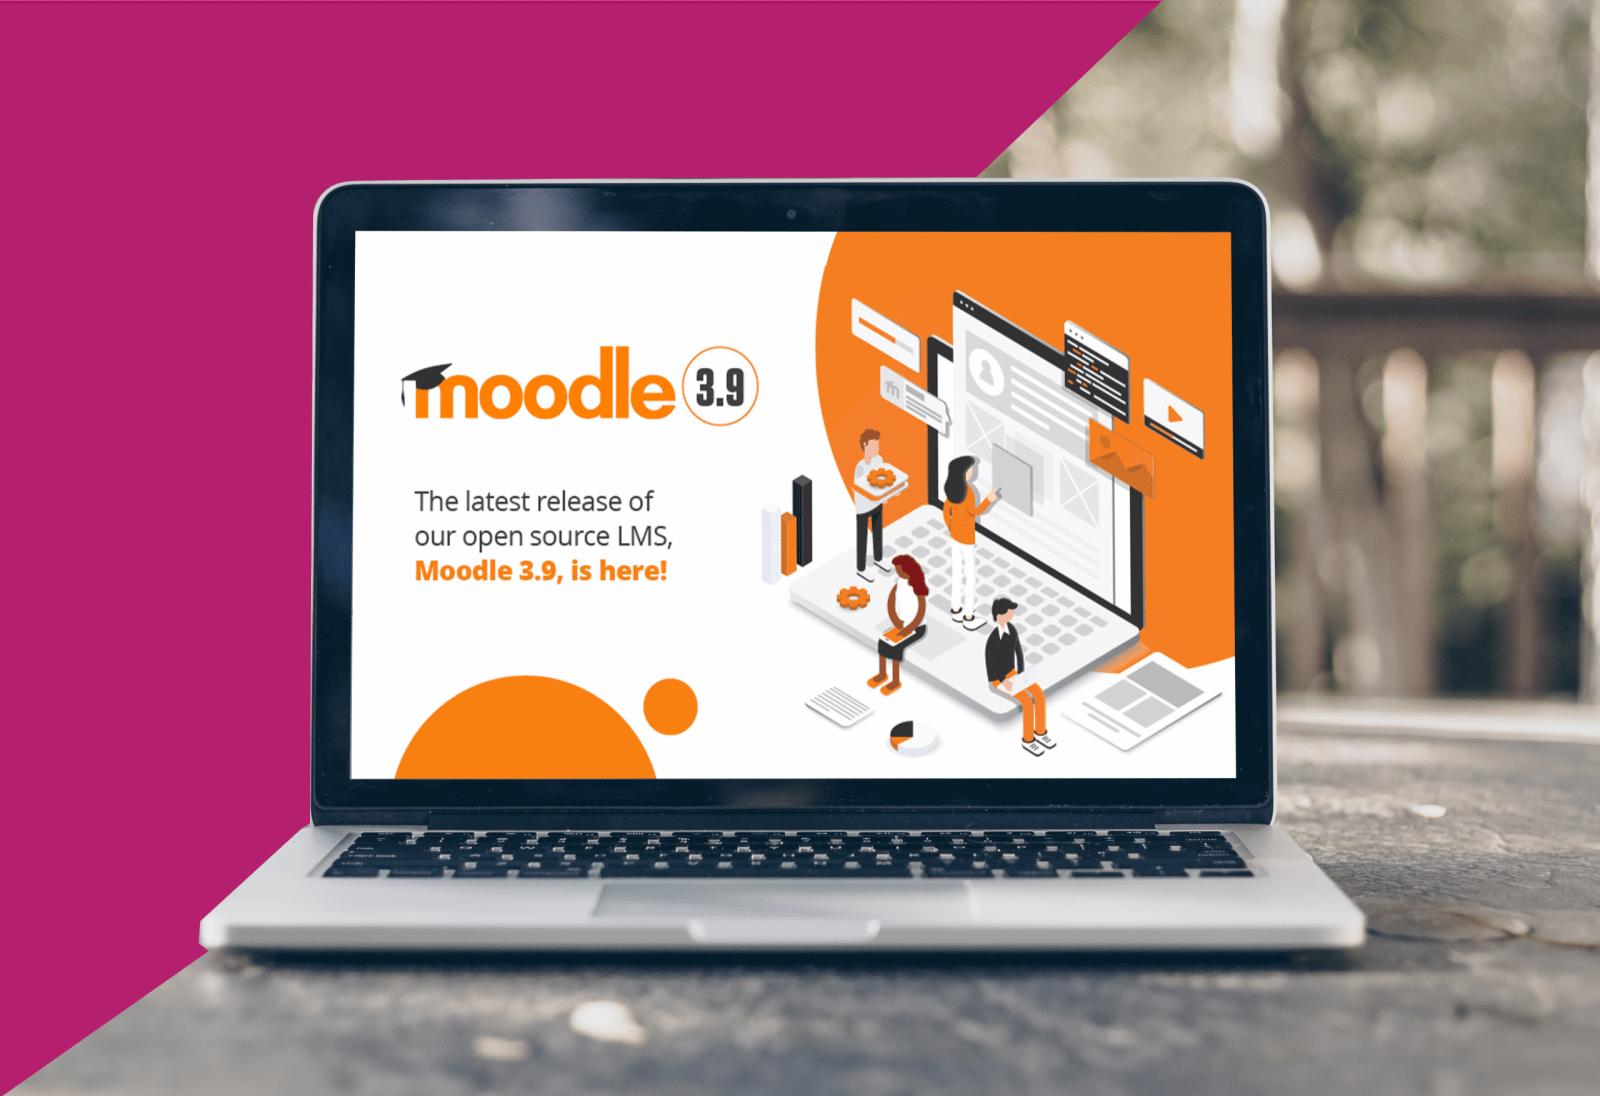 Moodle 3.9